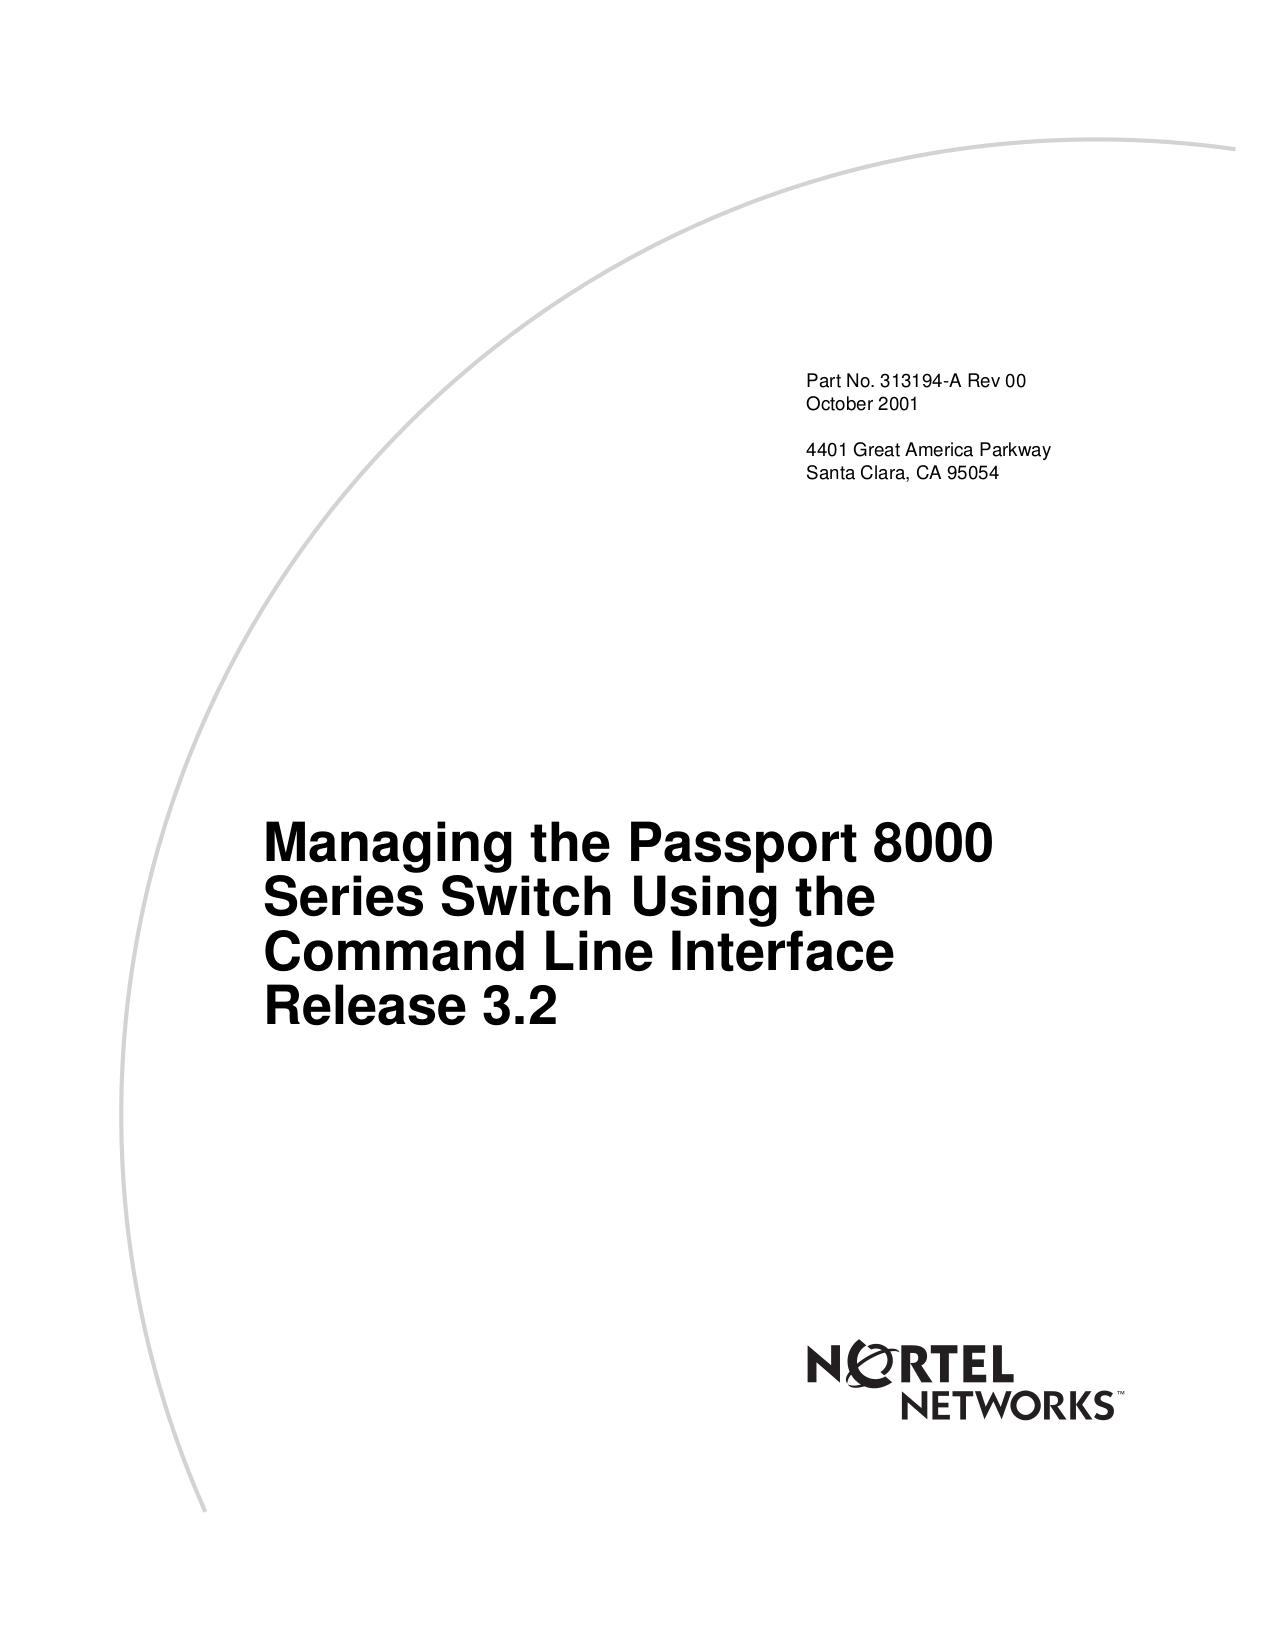 pdf for Nortel Switch Passport 8608GTE manual